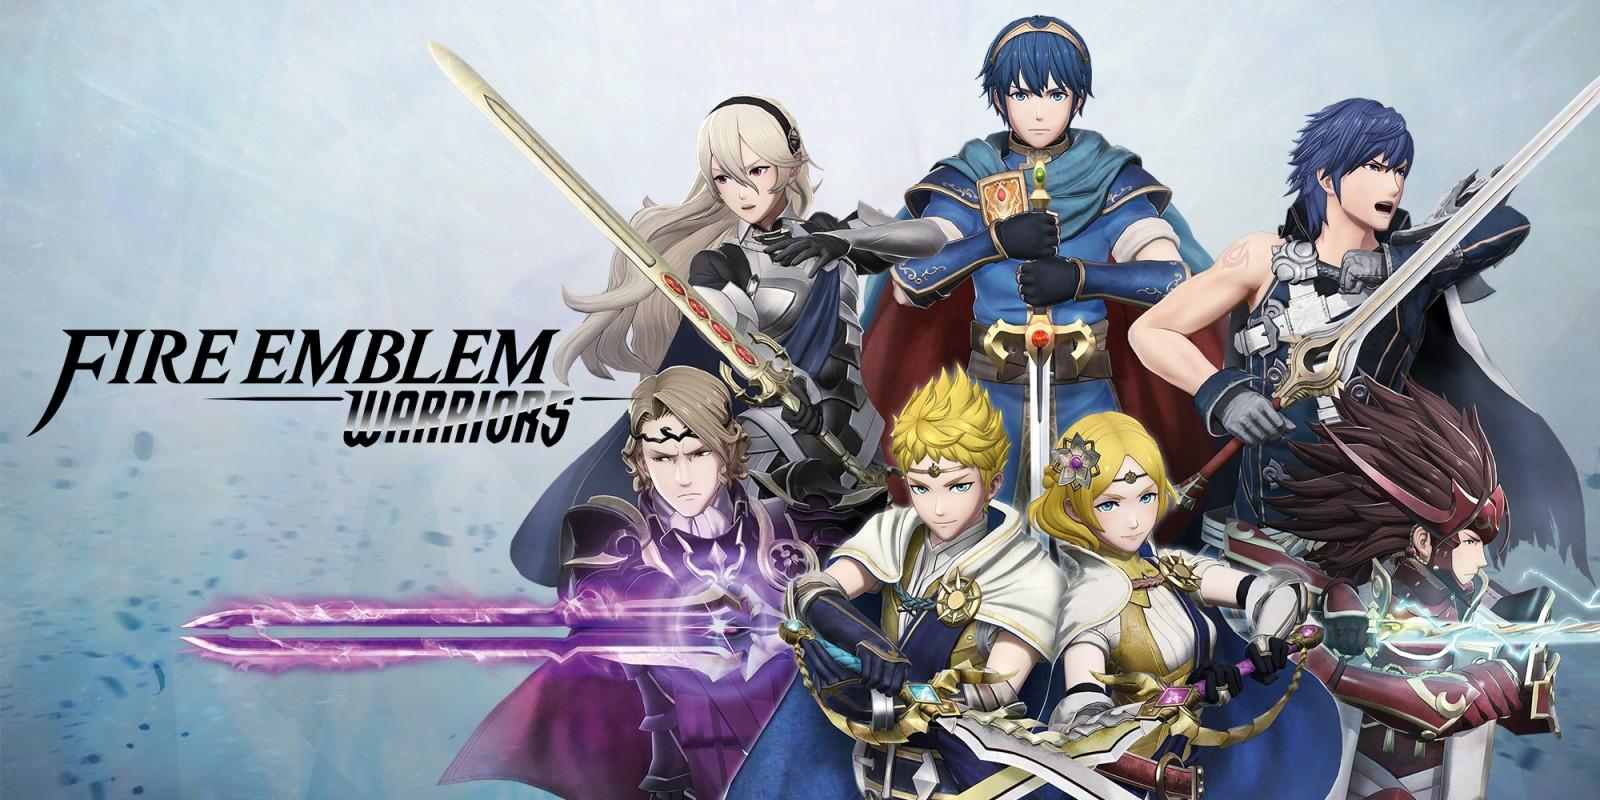 Today's Best Game Deals: Fire Emblem Warriors $32, Kingdom Hearts III $45, more